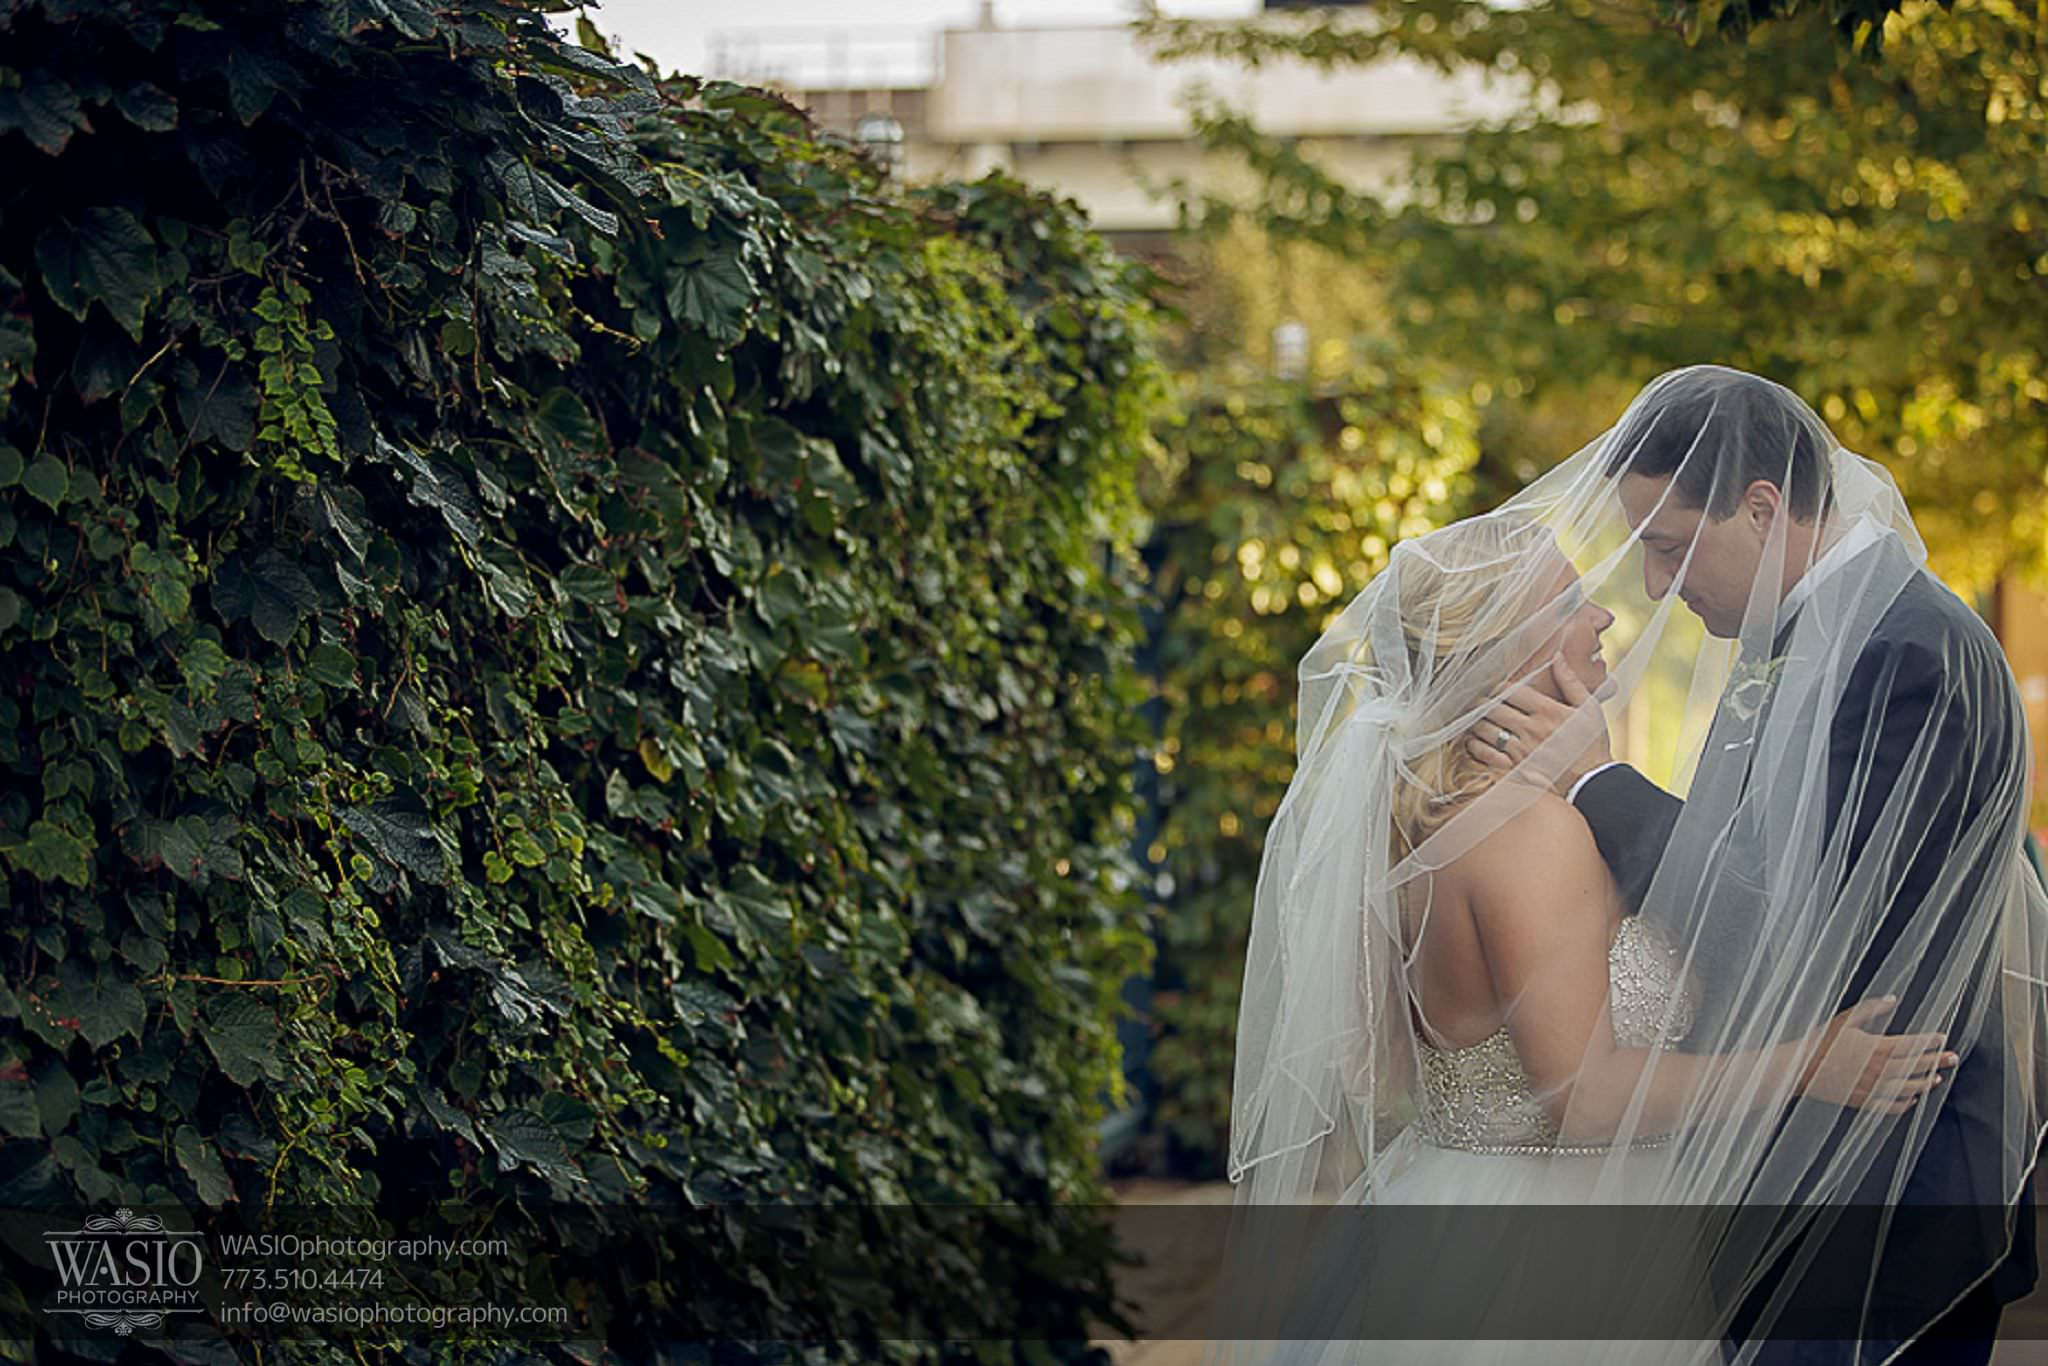 venue-one-chicago-wedding-intimate-kiss-under-veil-63 Venue One Chicago Wedding - Katie + Mike